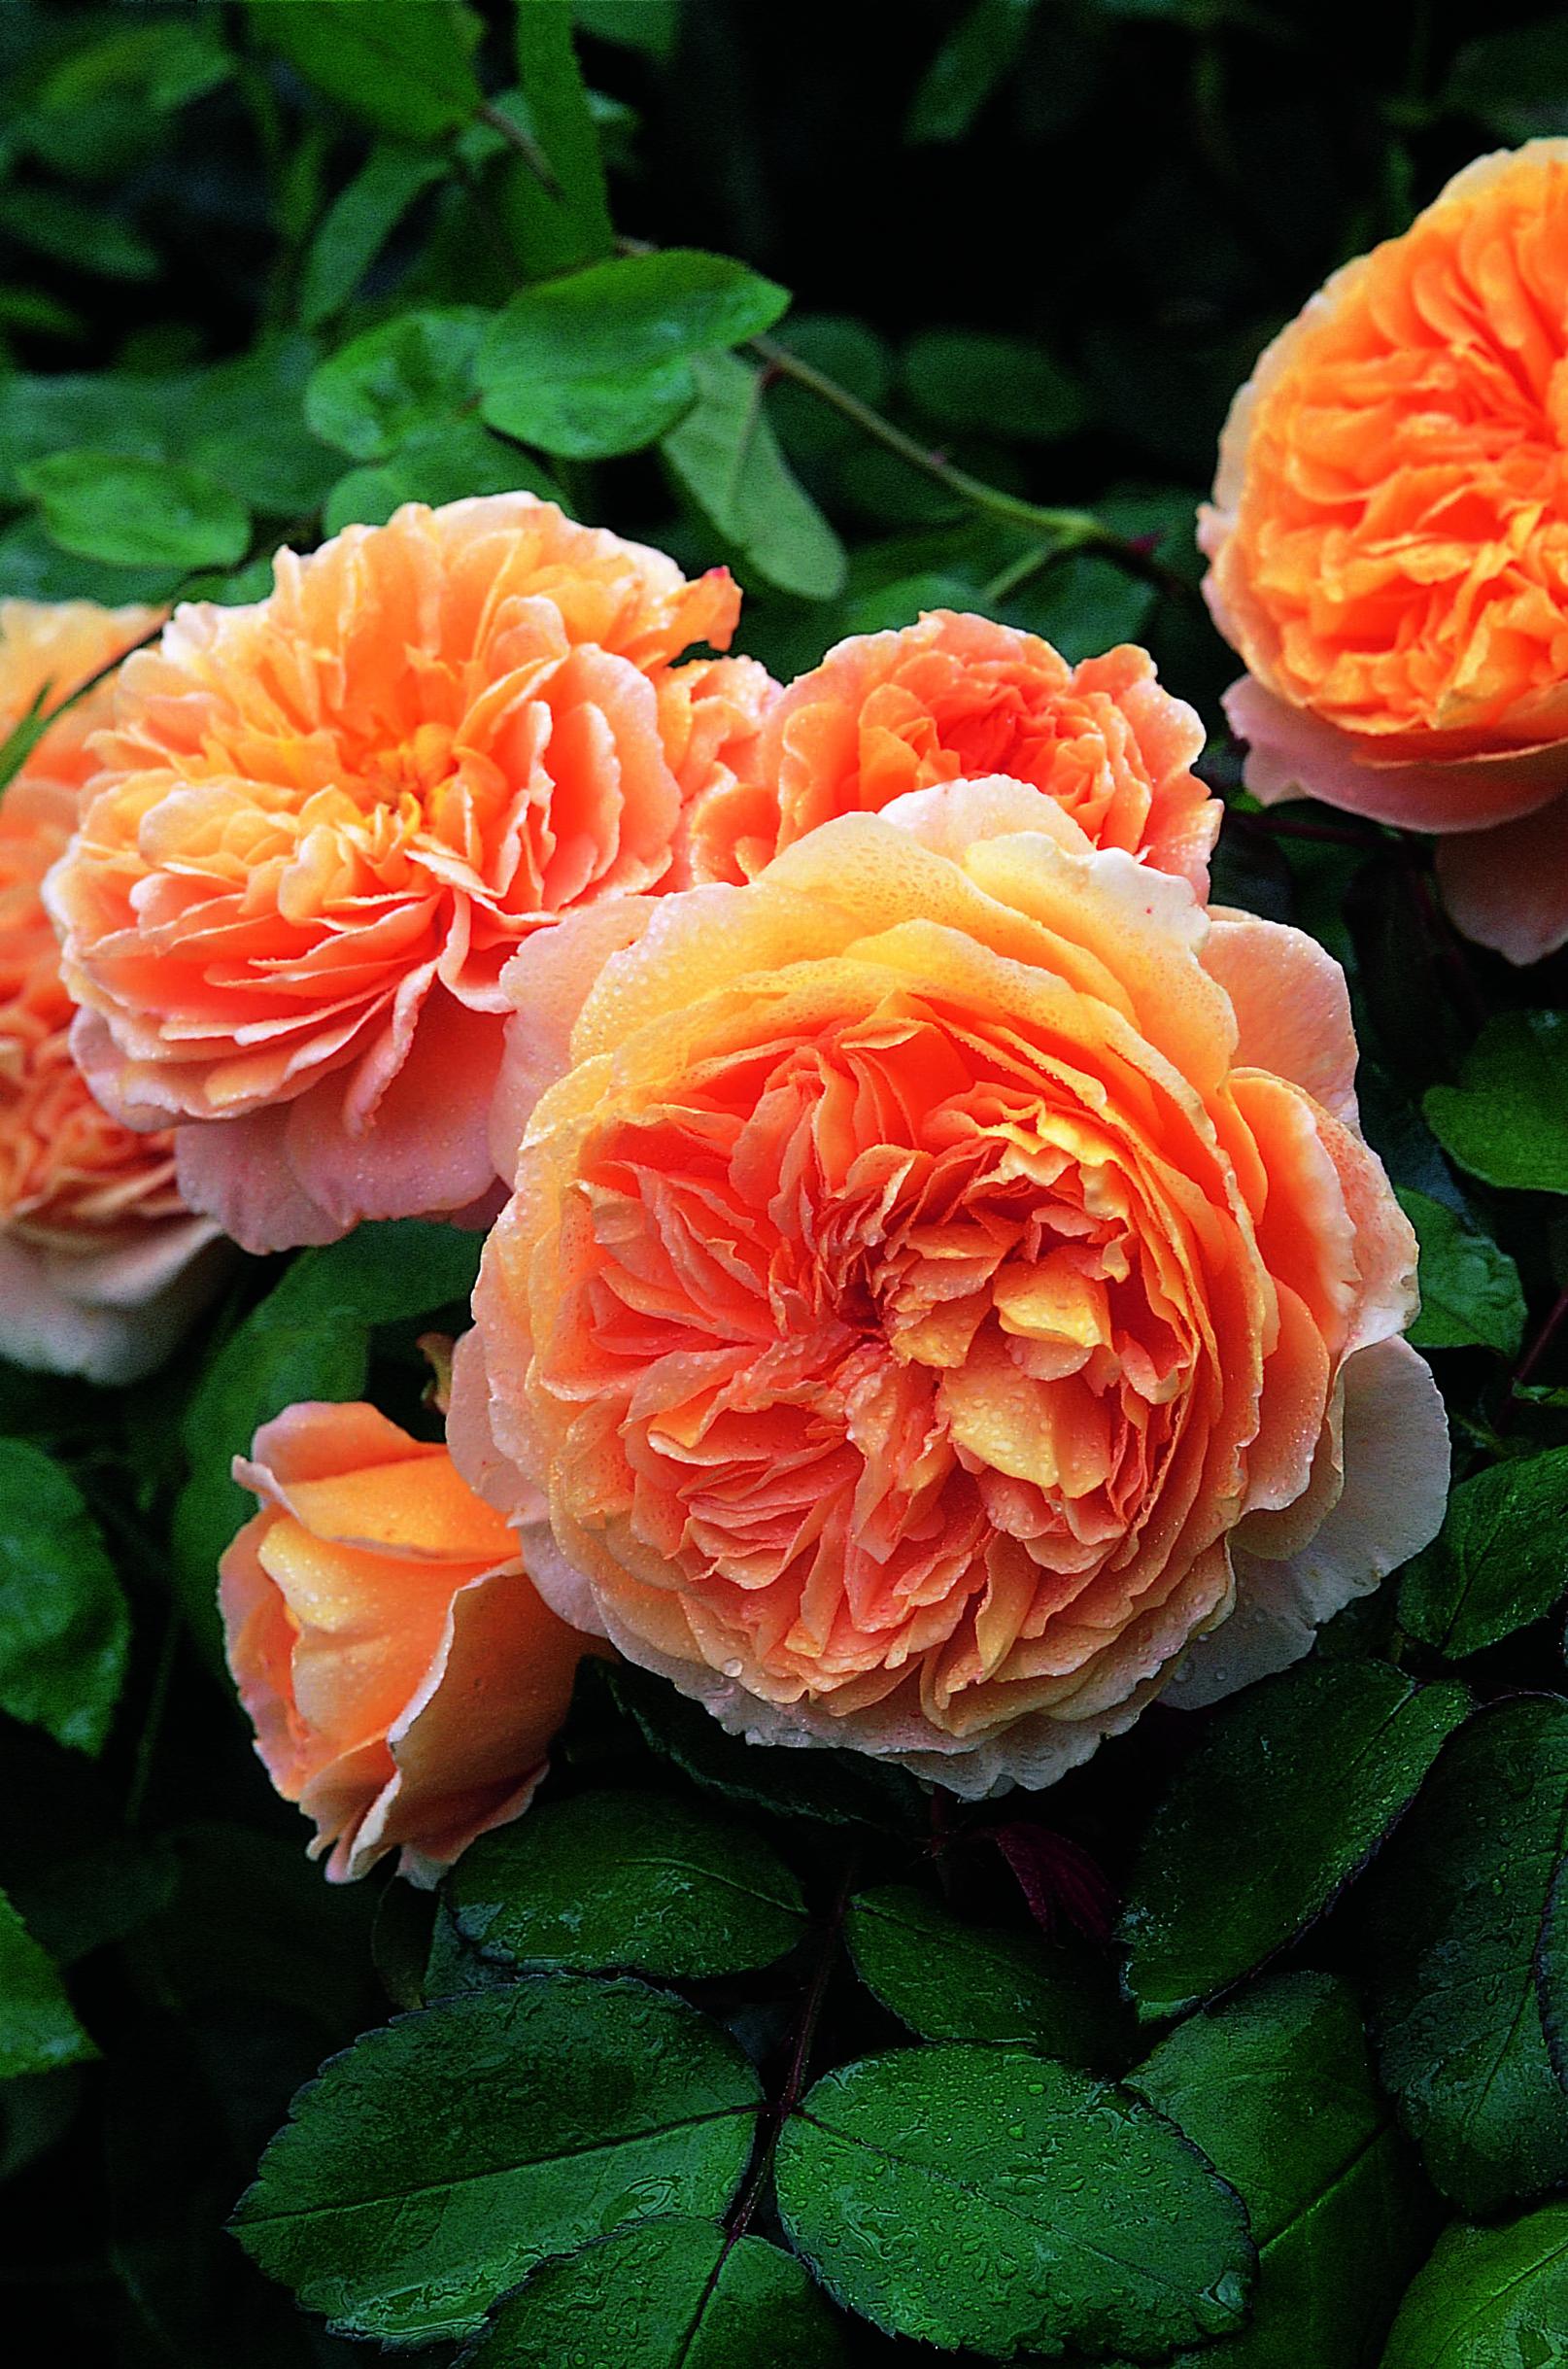 Crown princess margareta auswinter rose inglesi rosa for Rosa inglese